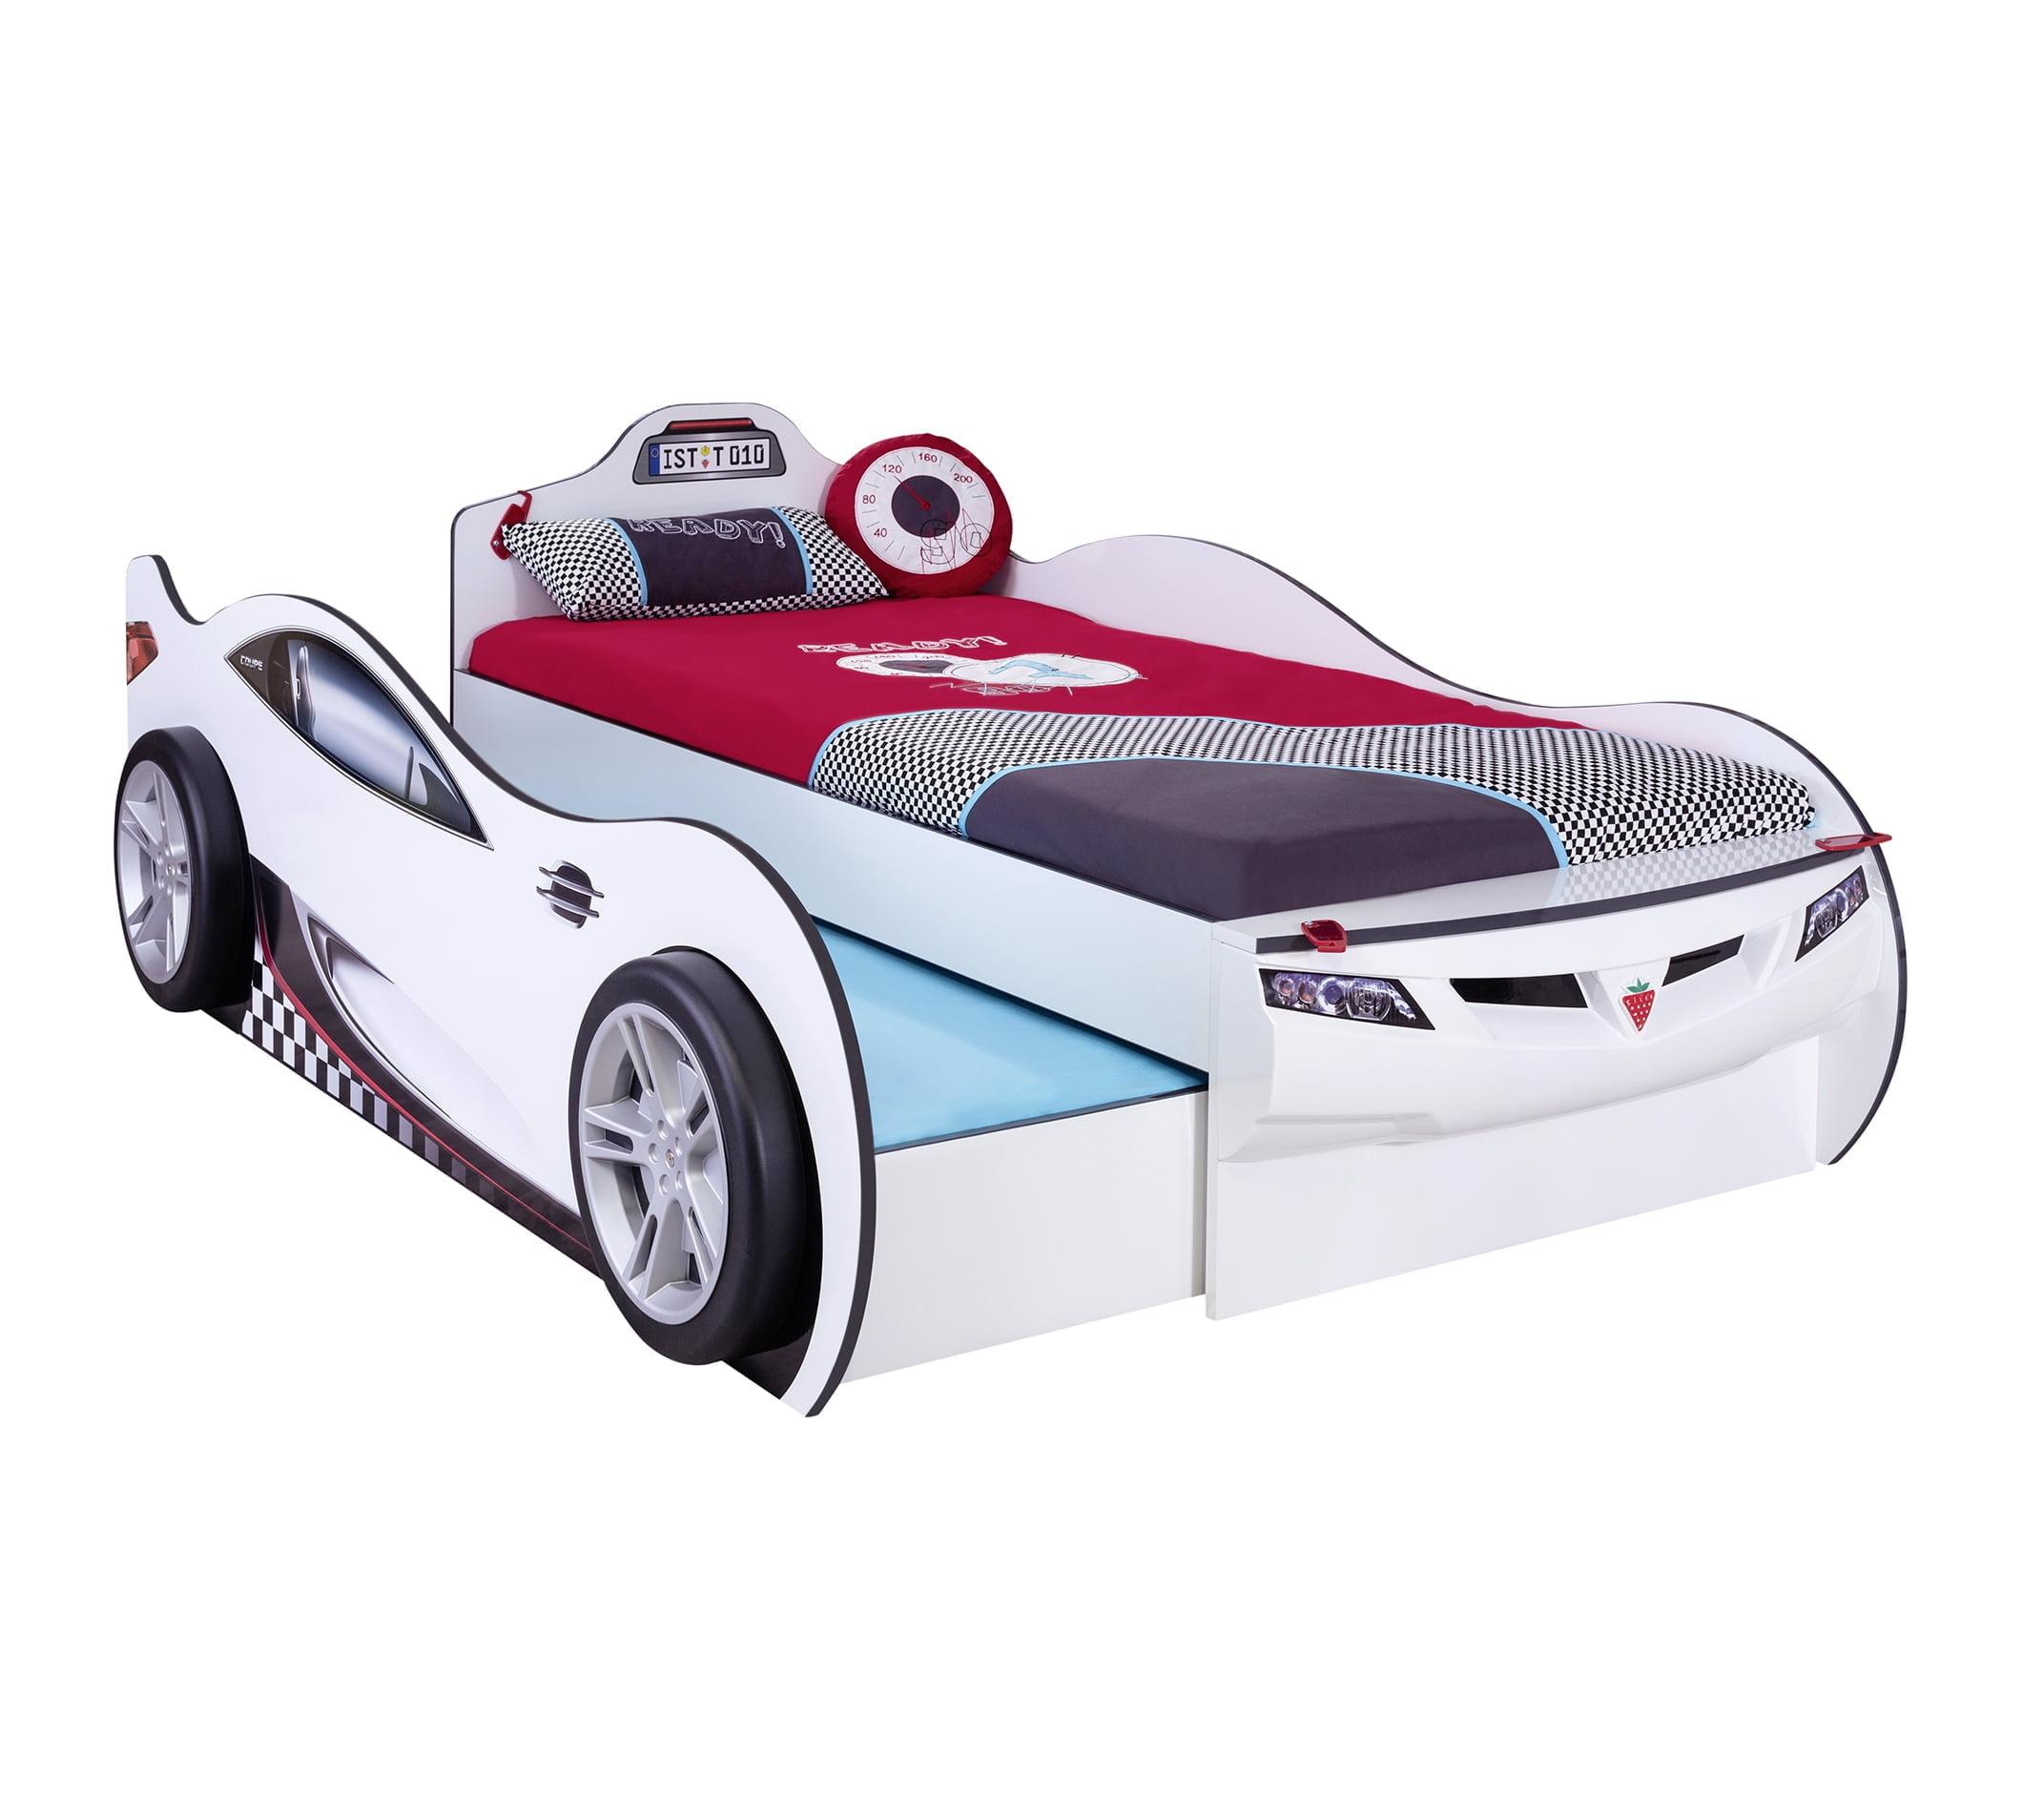 cilek-mobilya-coupe-araba-karyola-beyaz Çilek mobilya araba karyola modelleri